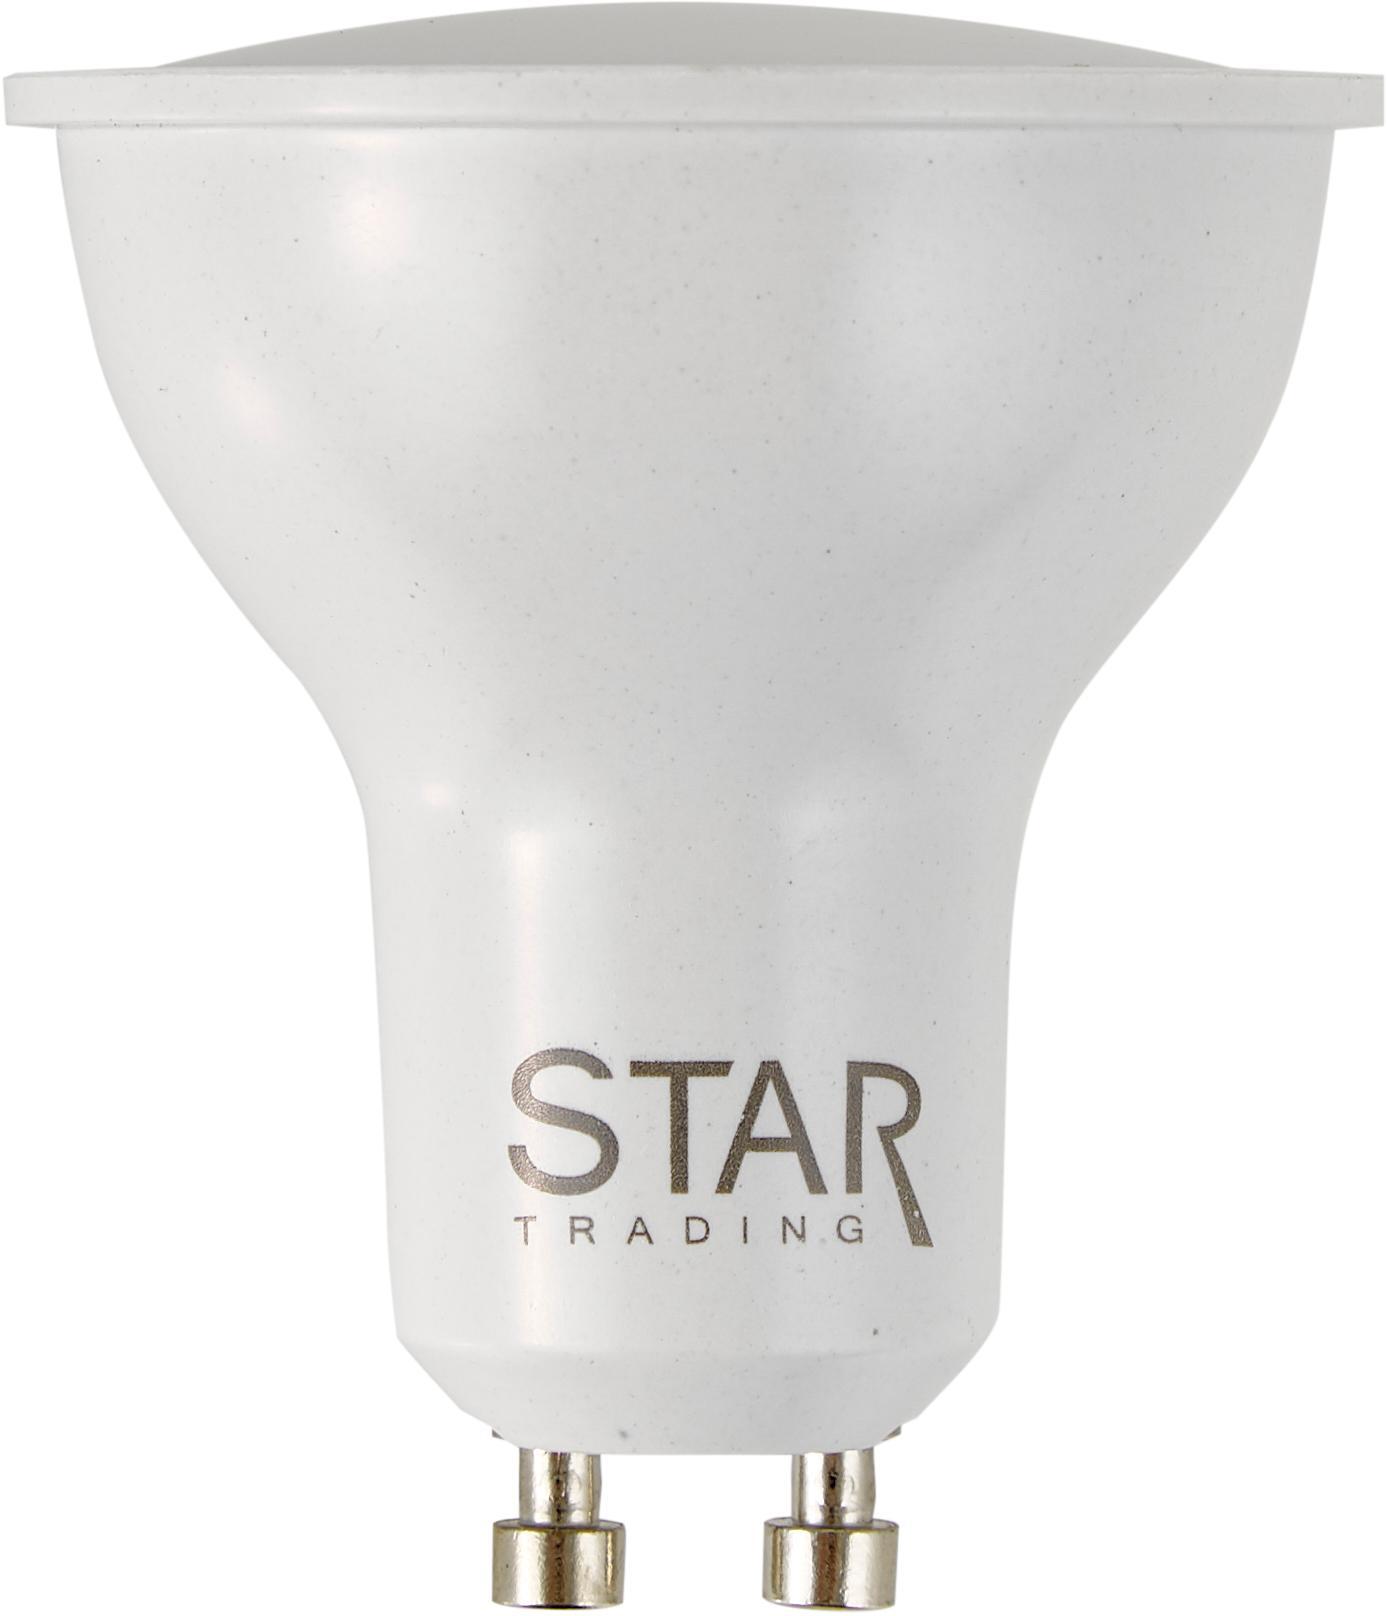 Dimmbares LED Leuchtmittel Dim To Warm (GU10/5.5W), Leuchtmittelschirm: Kunststoff, Leuchtmittelfassung: Aluminium, Weiß, Ø 5 x H 6 cm